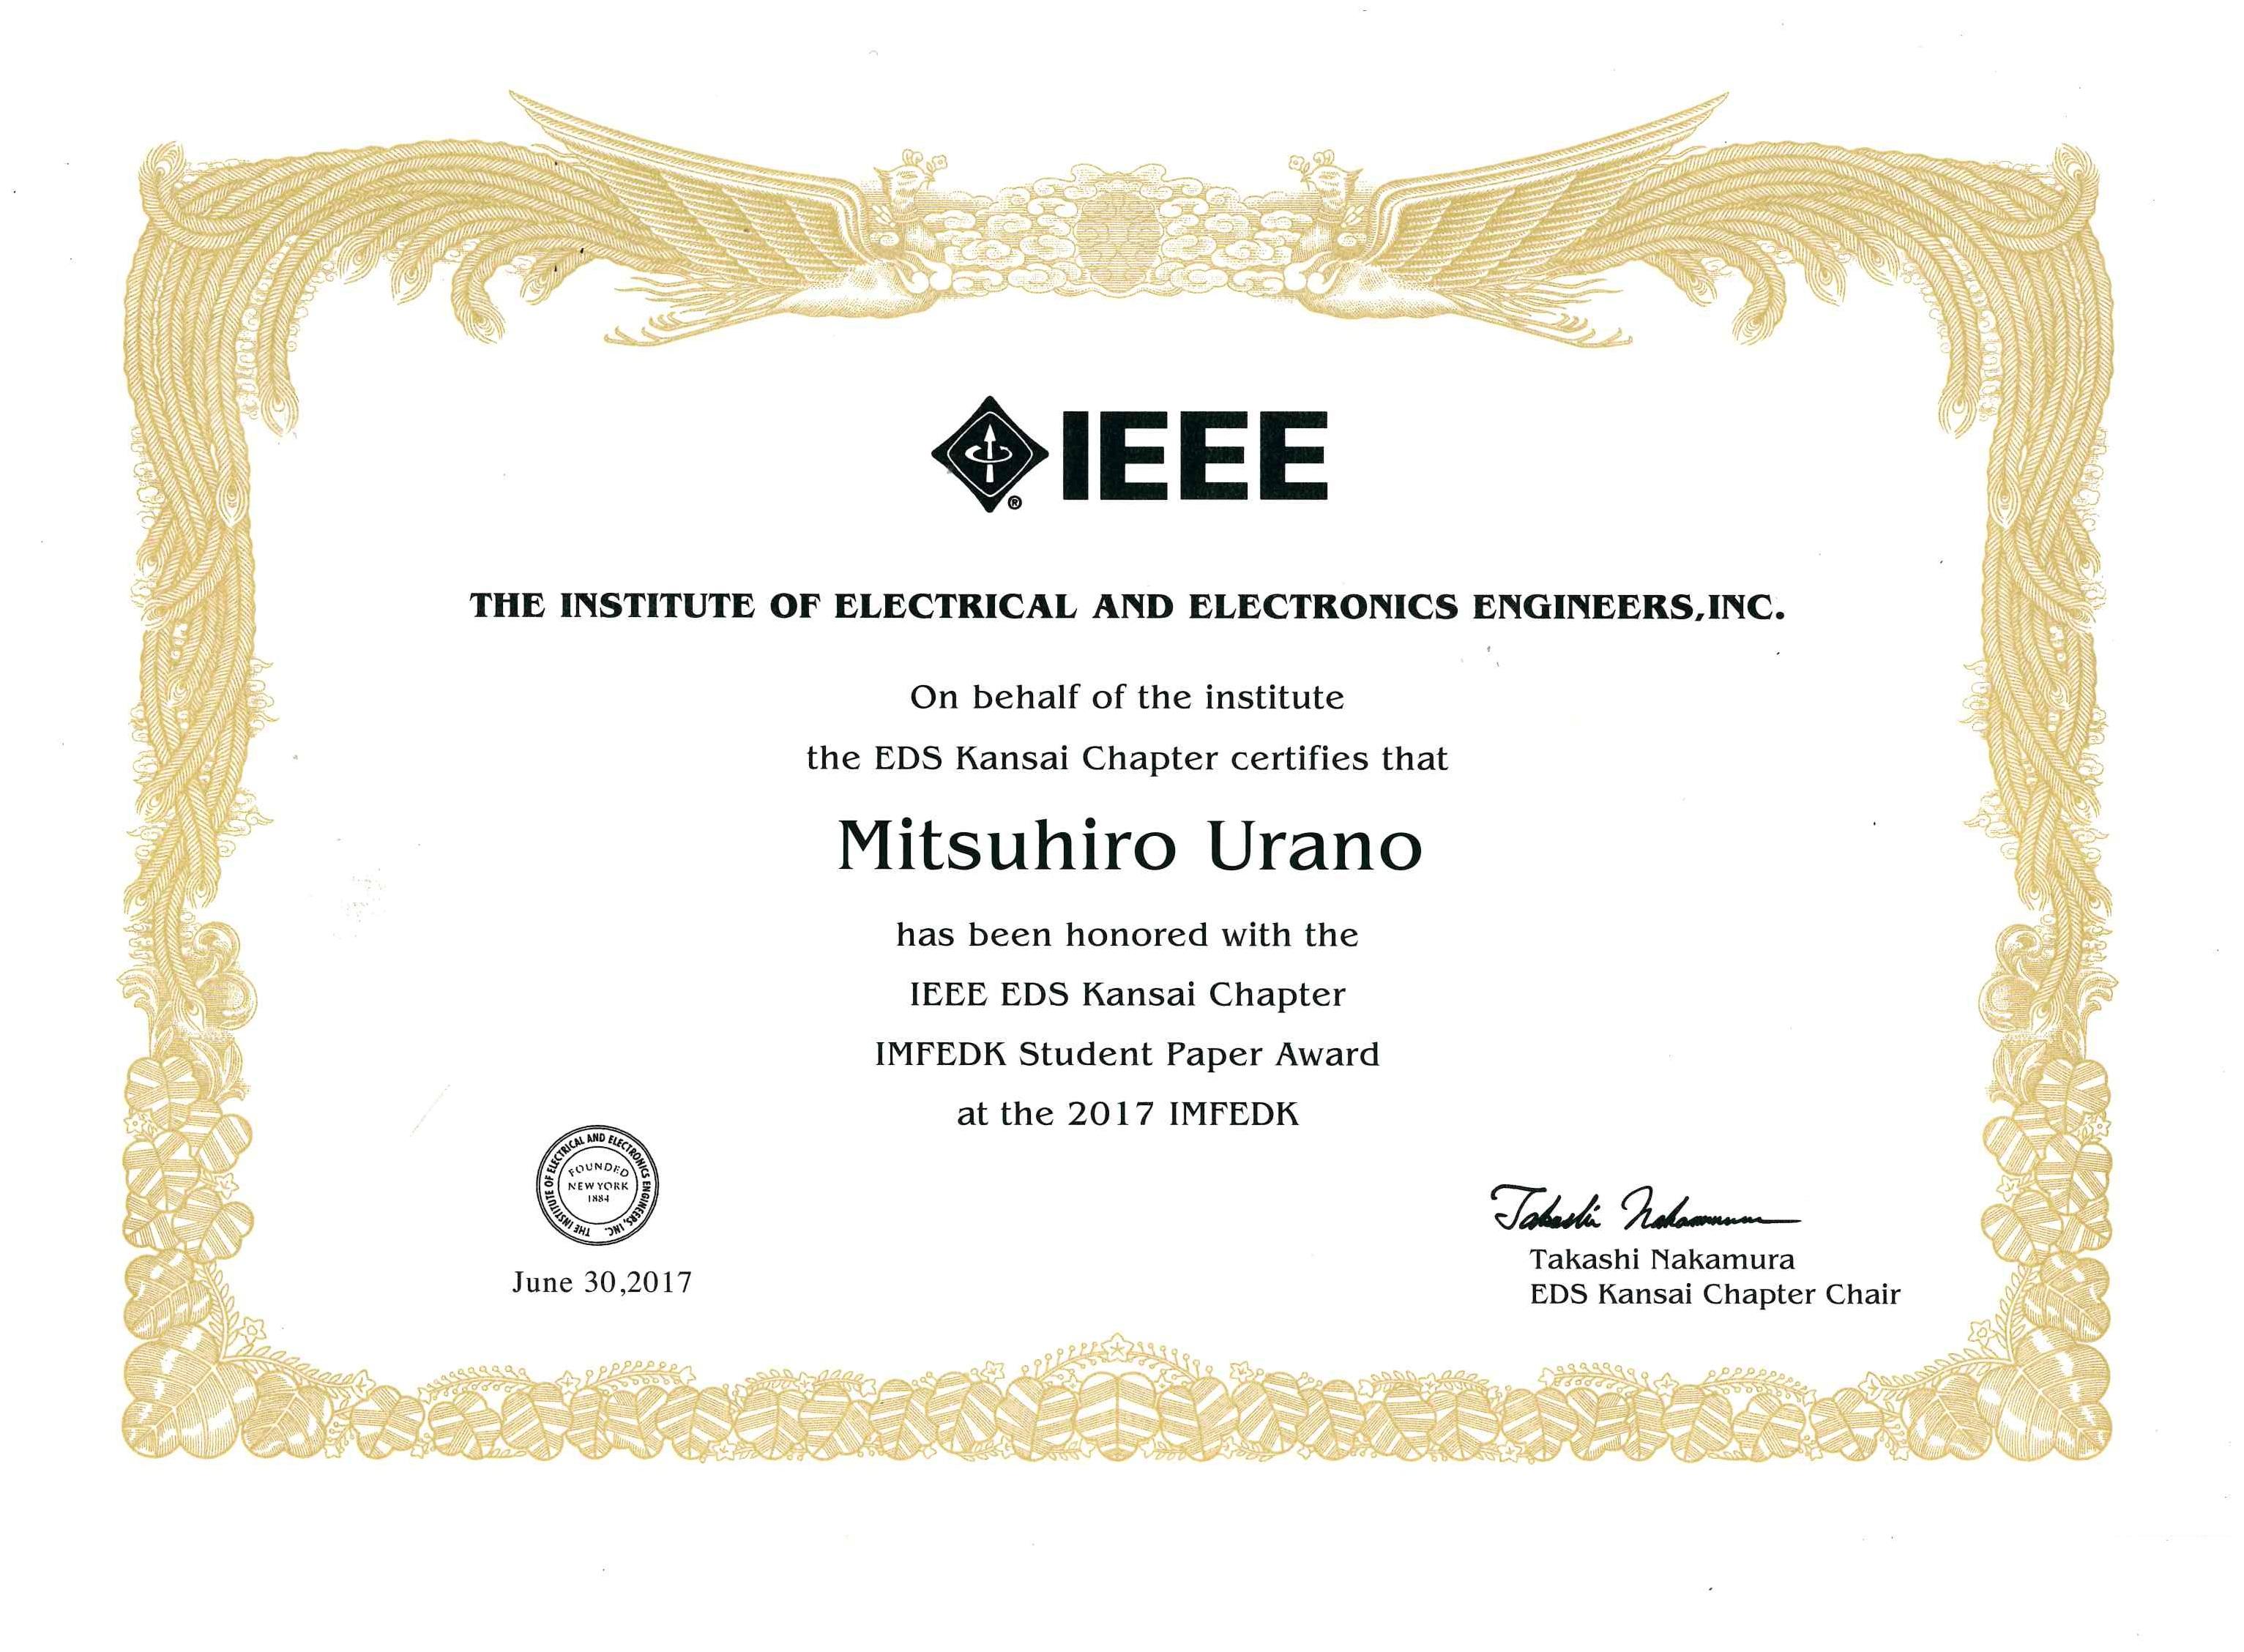 IMFEDK2017_Award_Urano.jpg